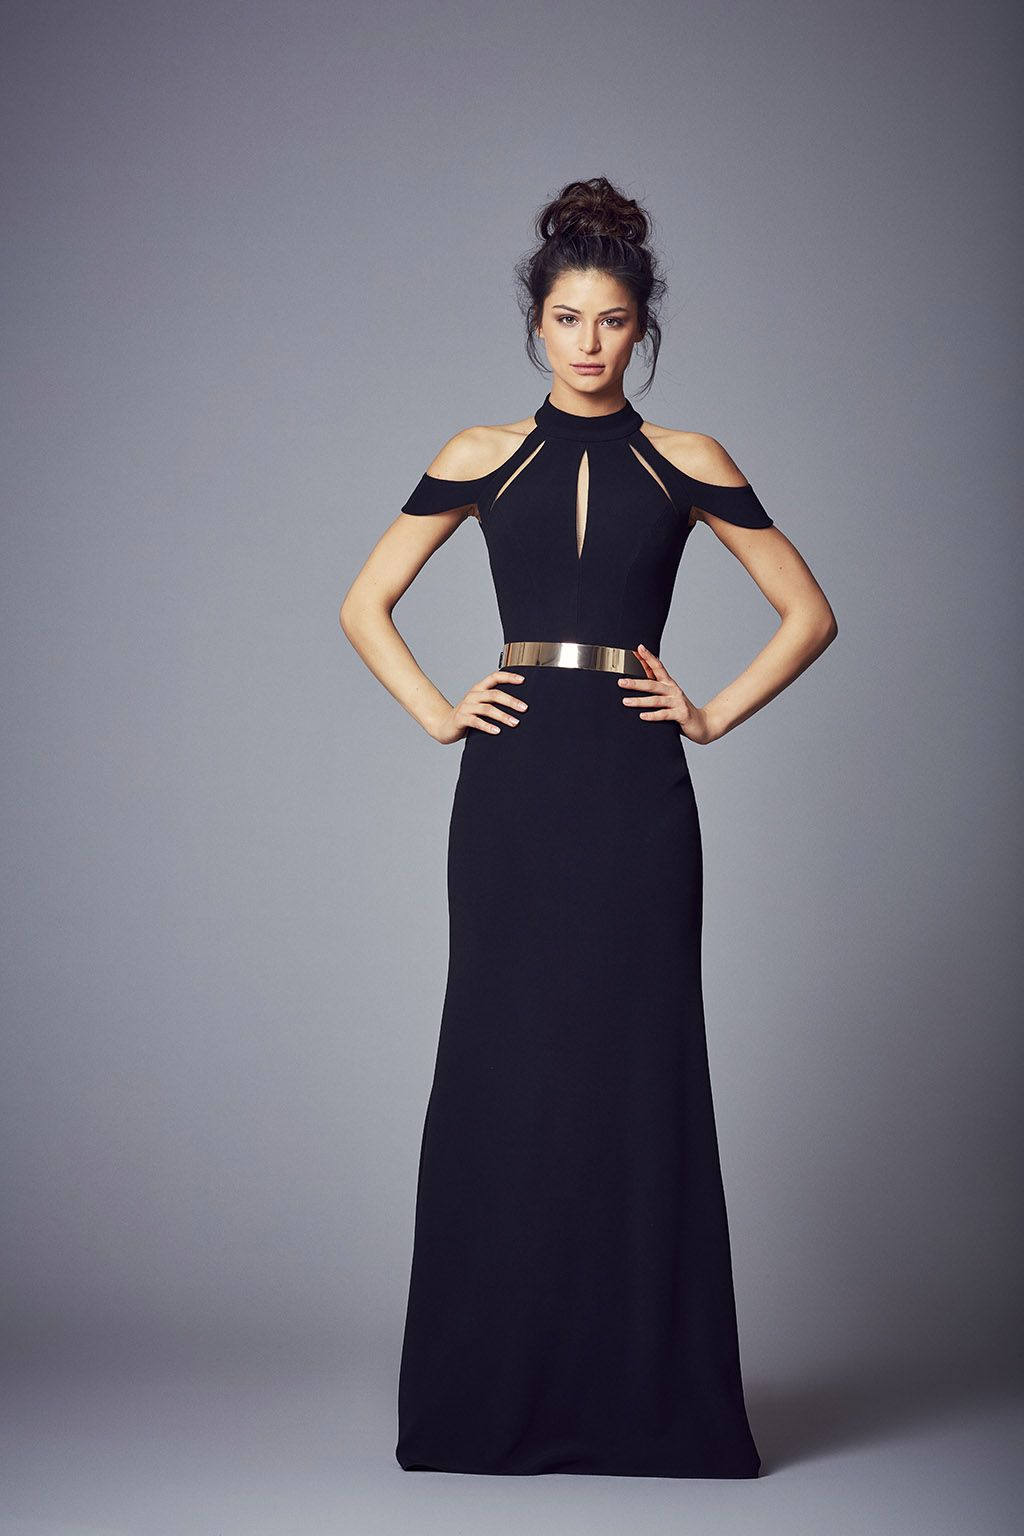 d4a7bf006b7 Designer Evening Wear - Gown Designs